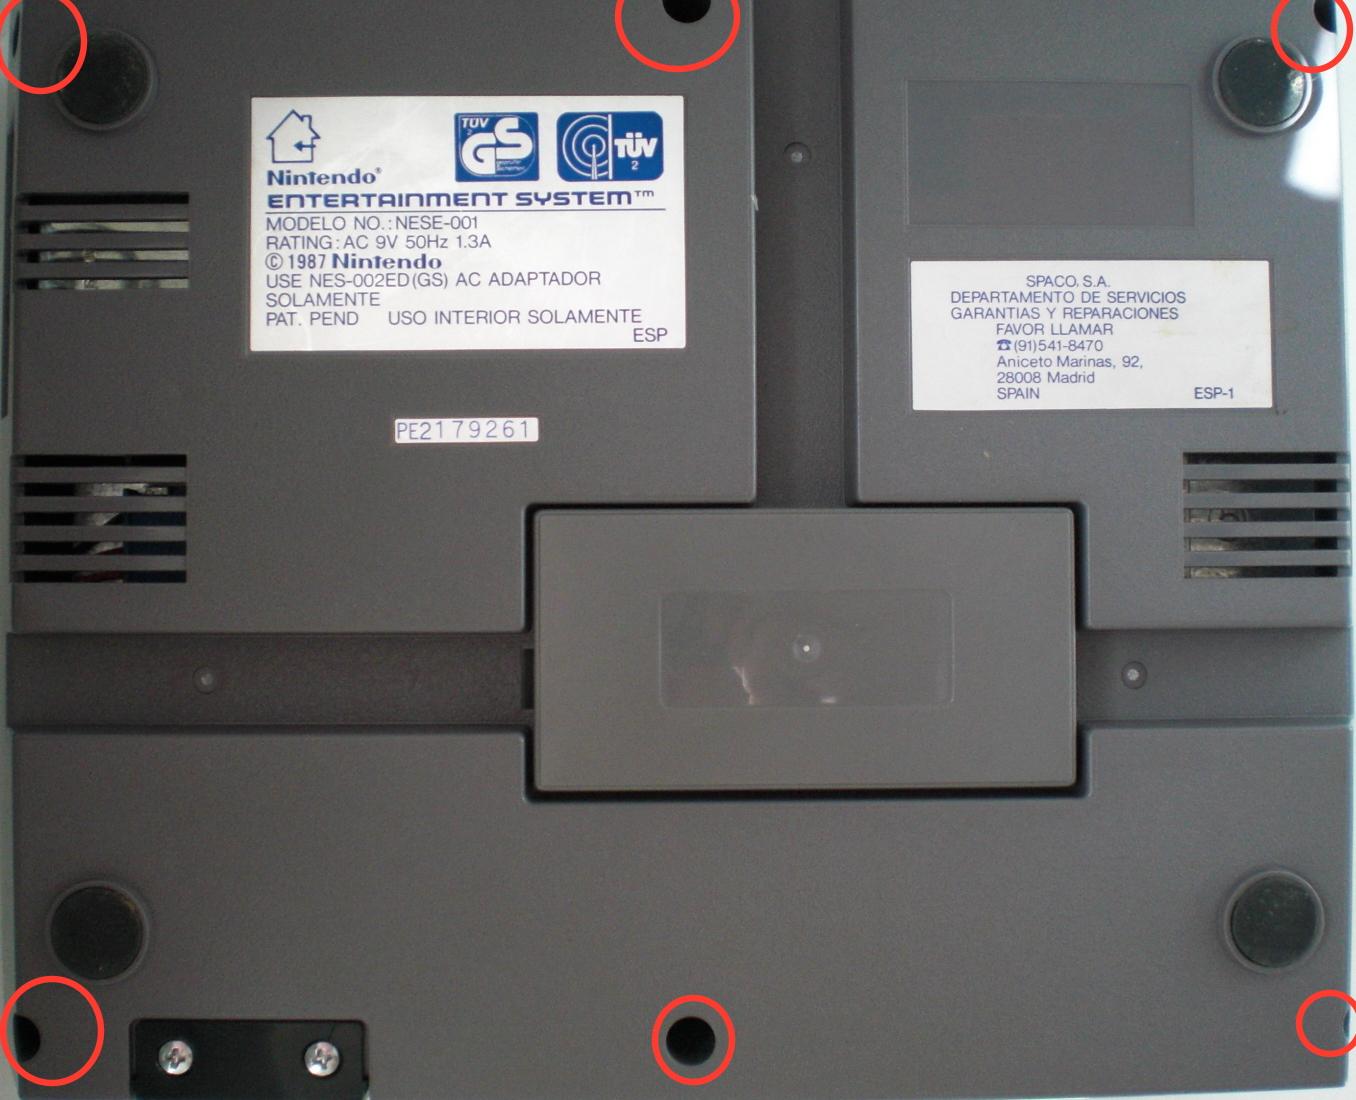 Primero desatornillar los seis tornillos para abrir la NES